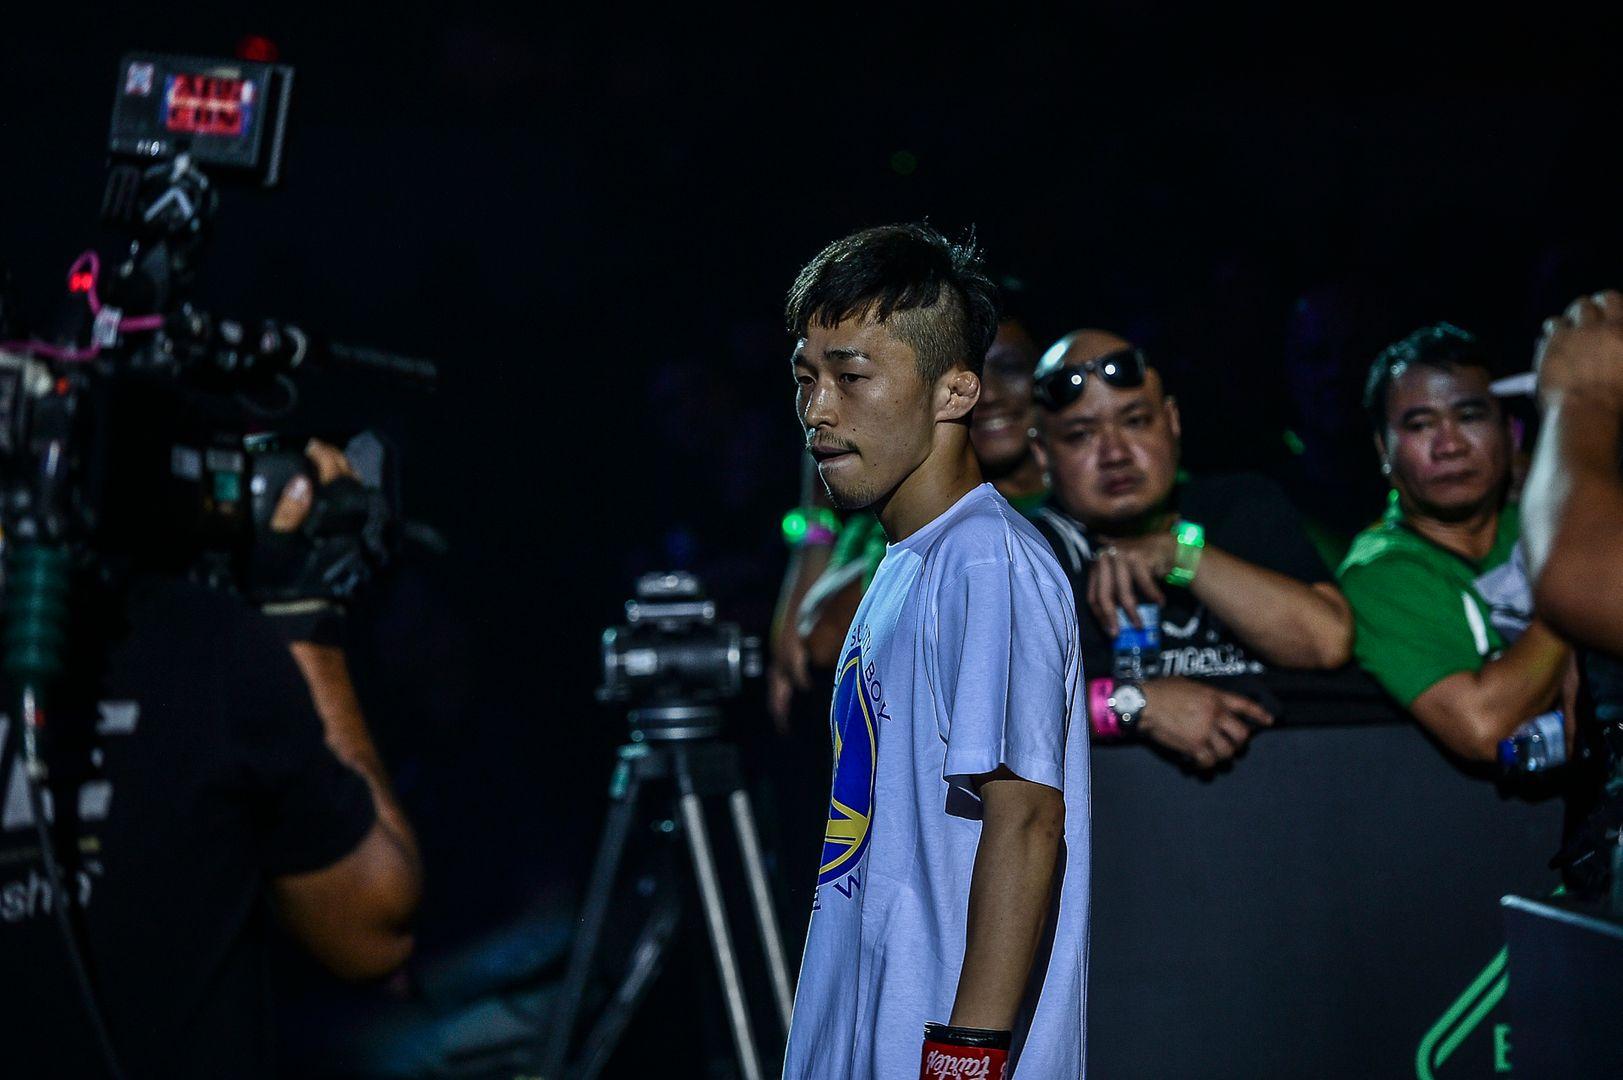 ONE Championship flyweight Tatsumitsu Wada